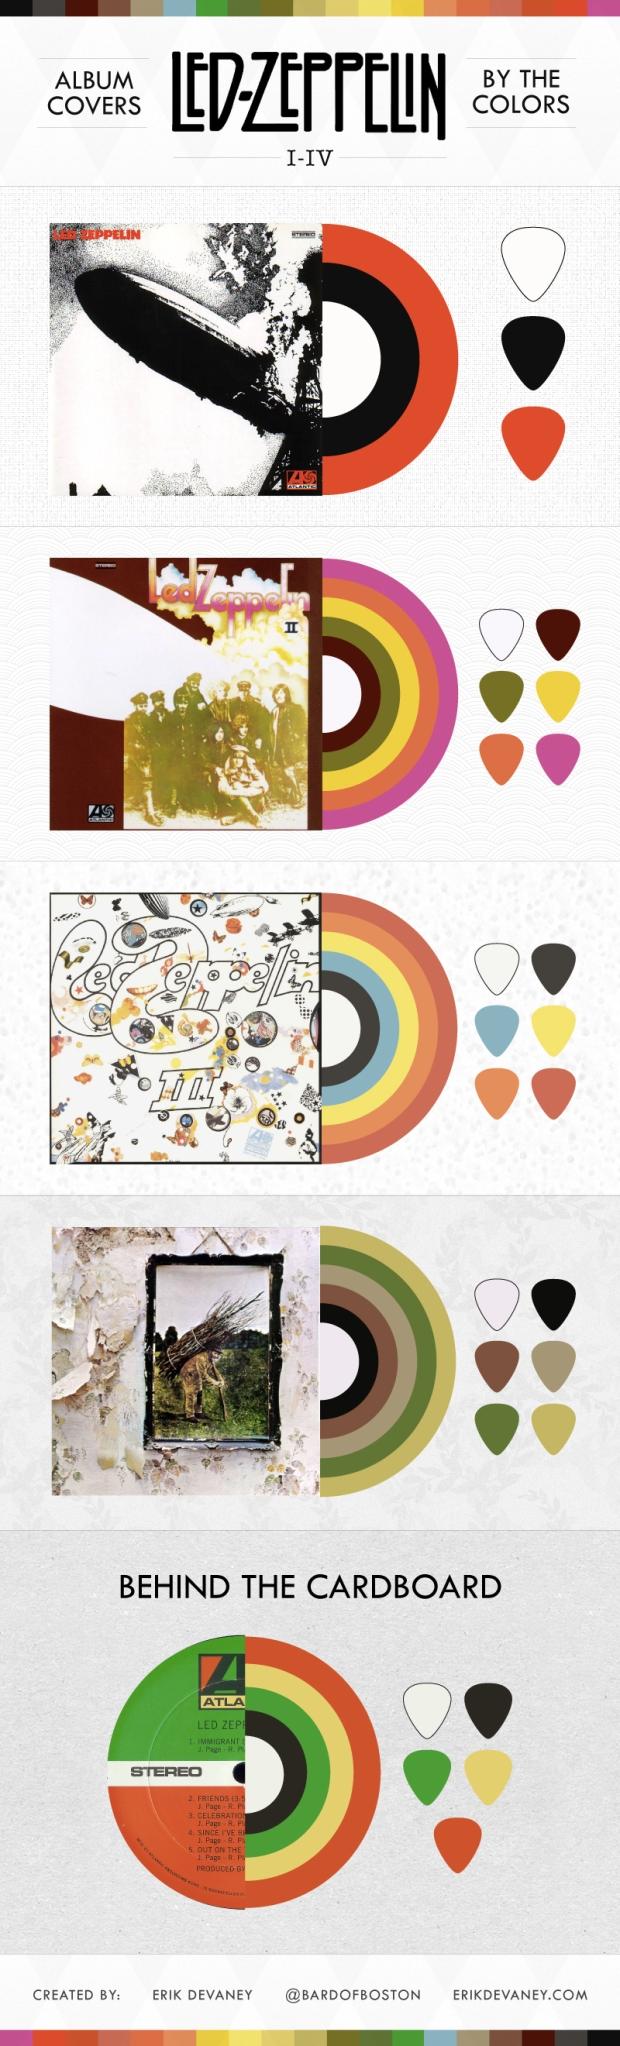 Led-Zeppelin-Albums-Color-Palette